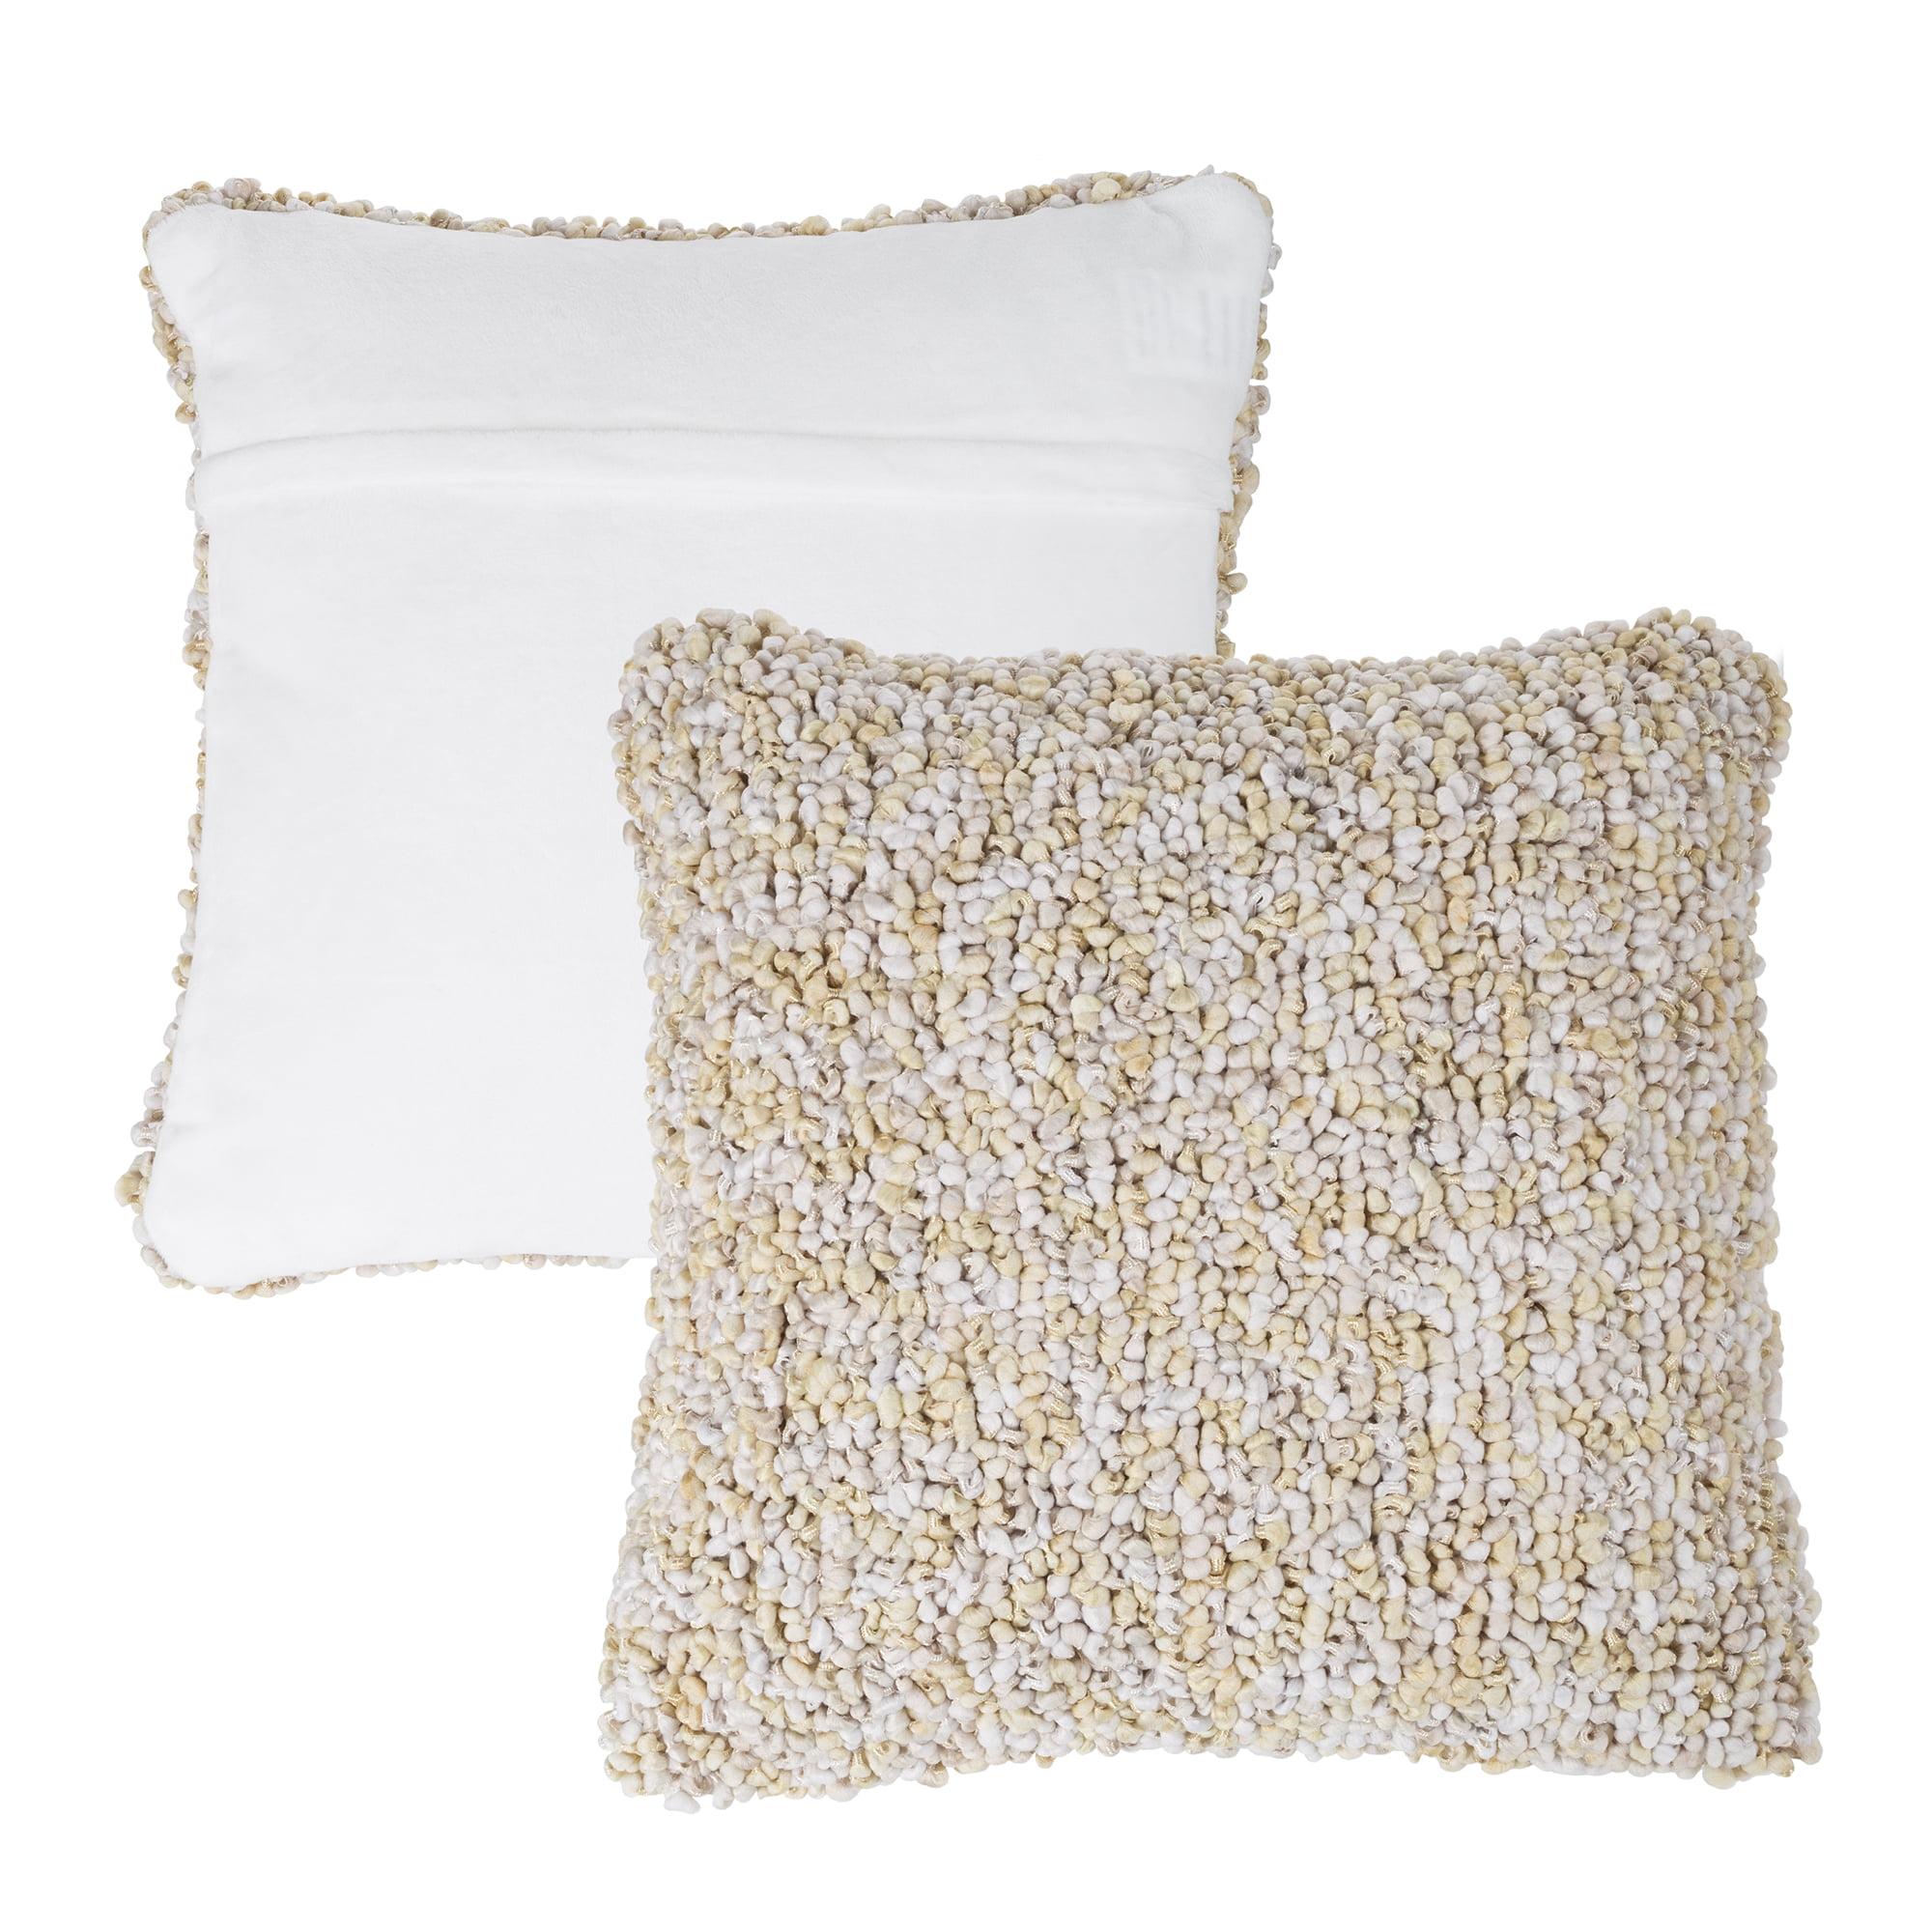 Shop home decor chevron stripes pillow from shop home decor - Shop Home Decor Chevron Stripes Pillow From Shop Home Decor 49